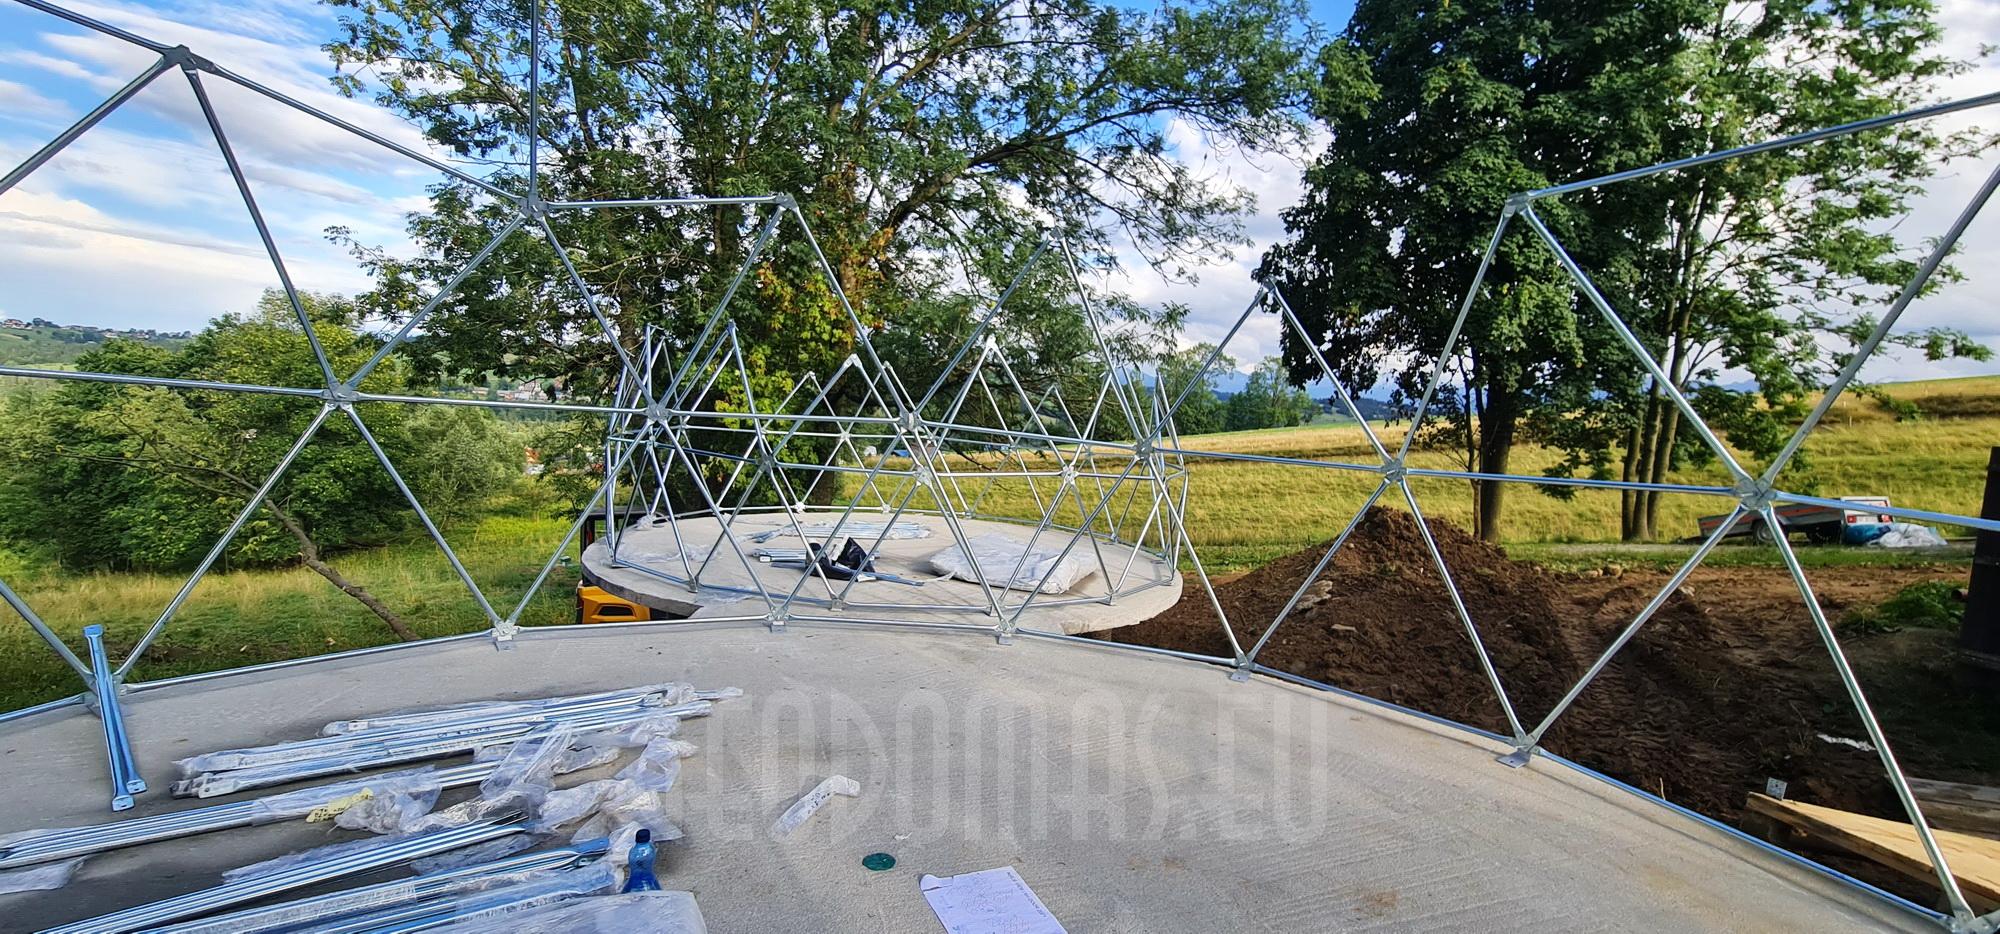 35m²+20m² Glamping SPA Domes Ø6,7m & Ø5m   Zakopane, Poland